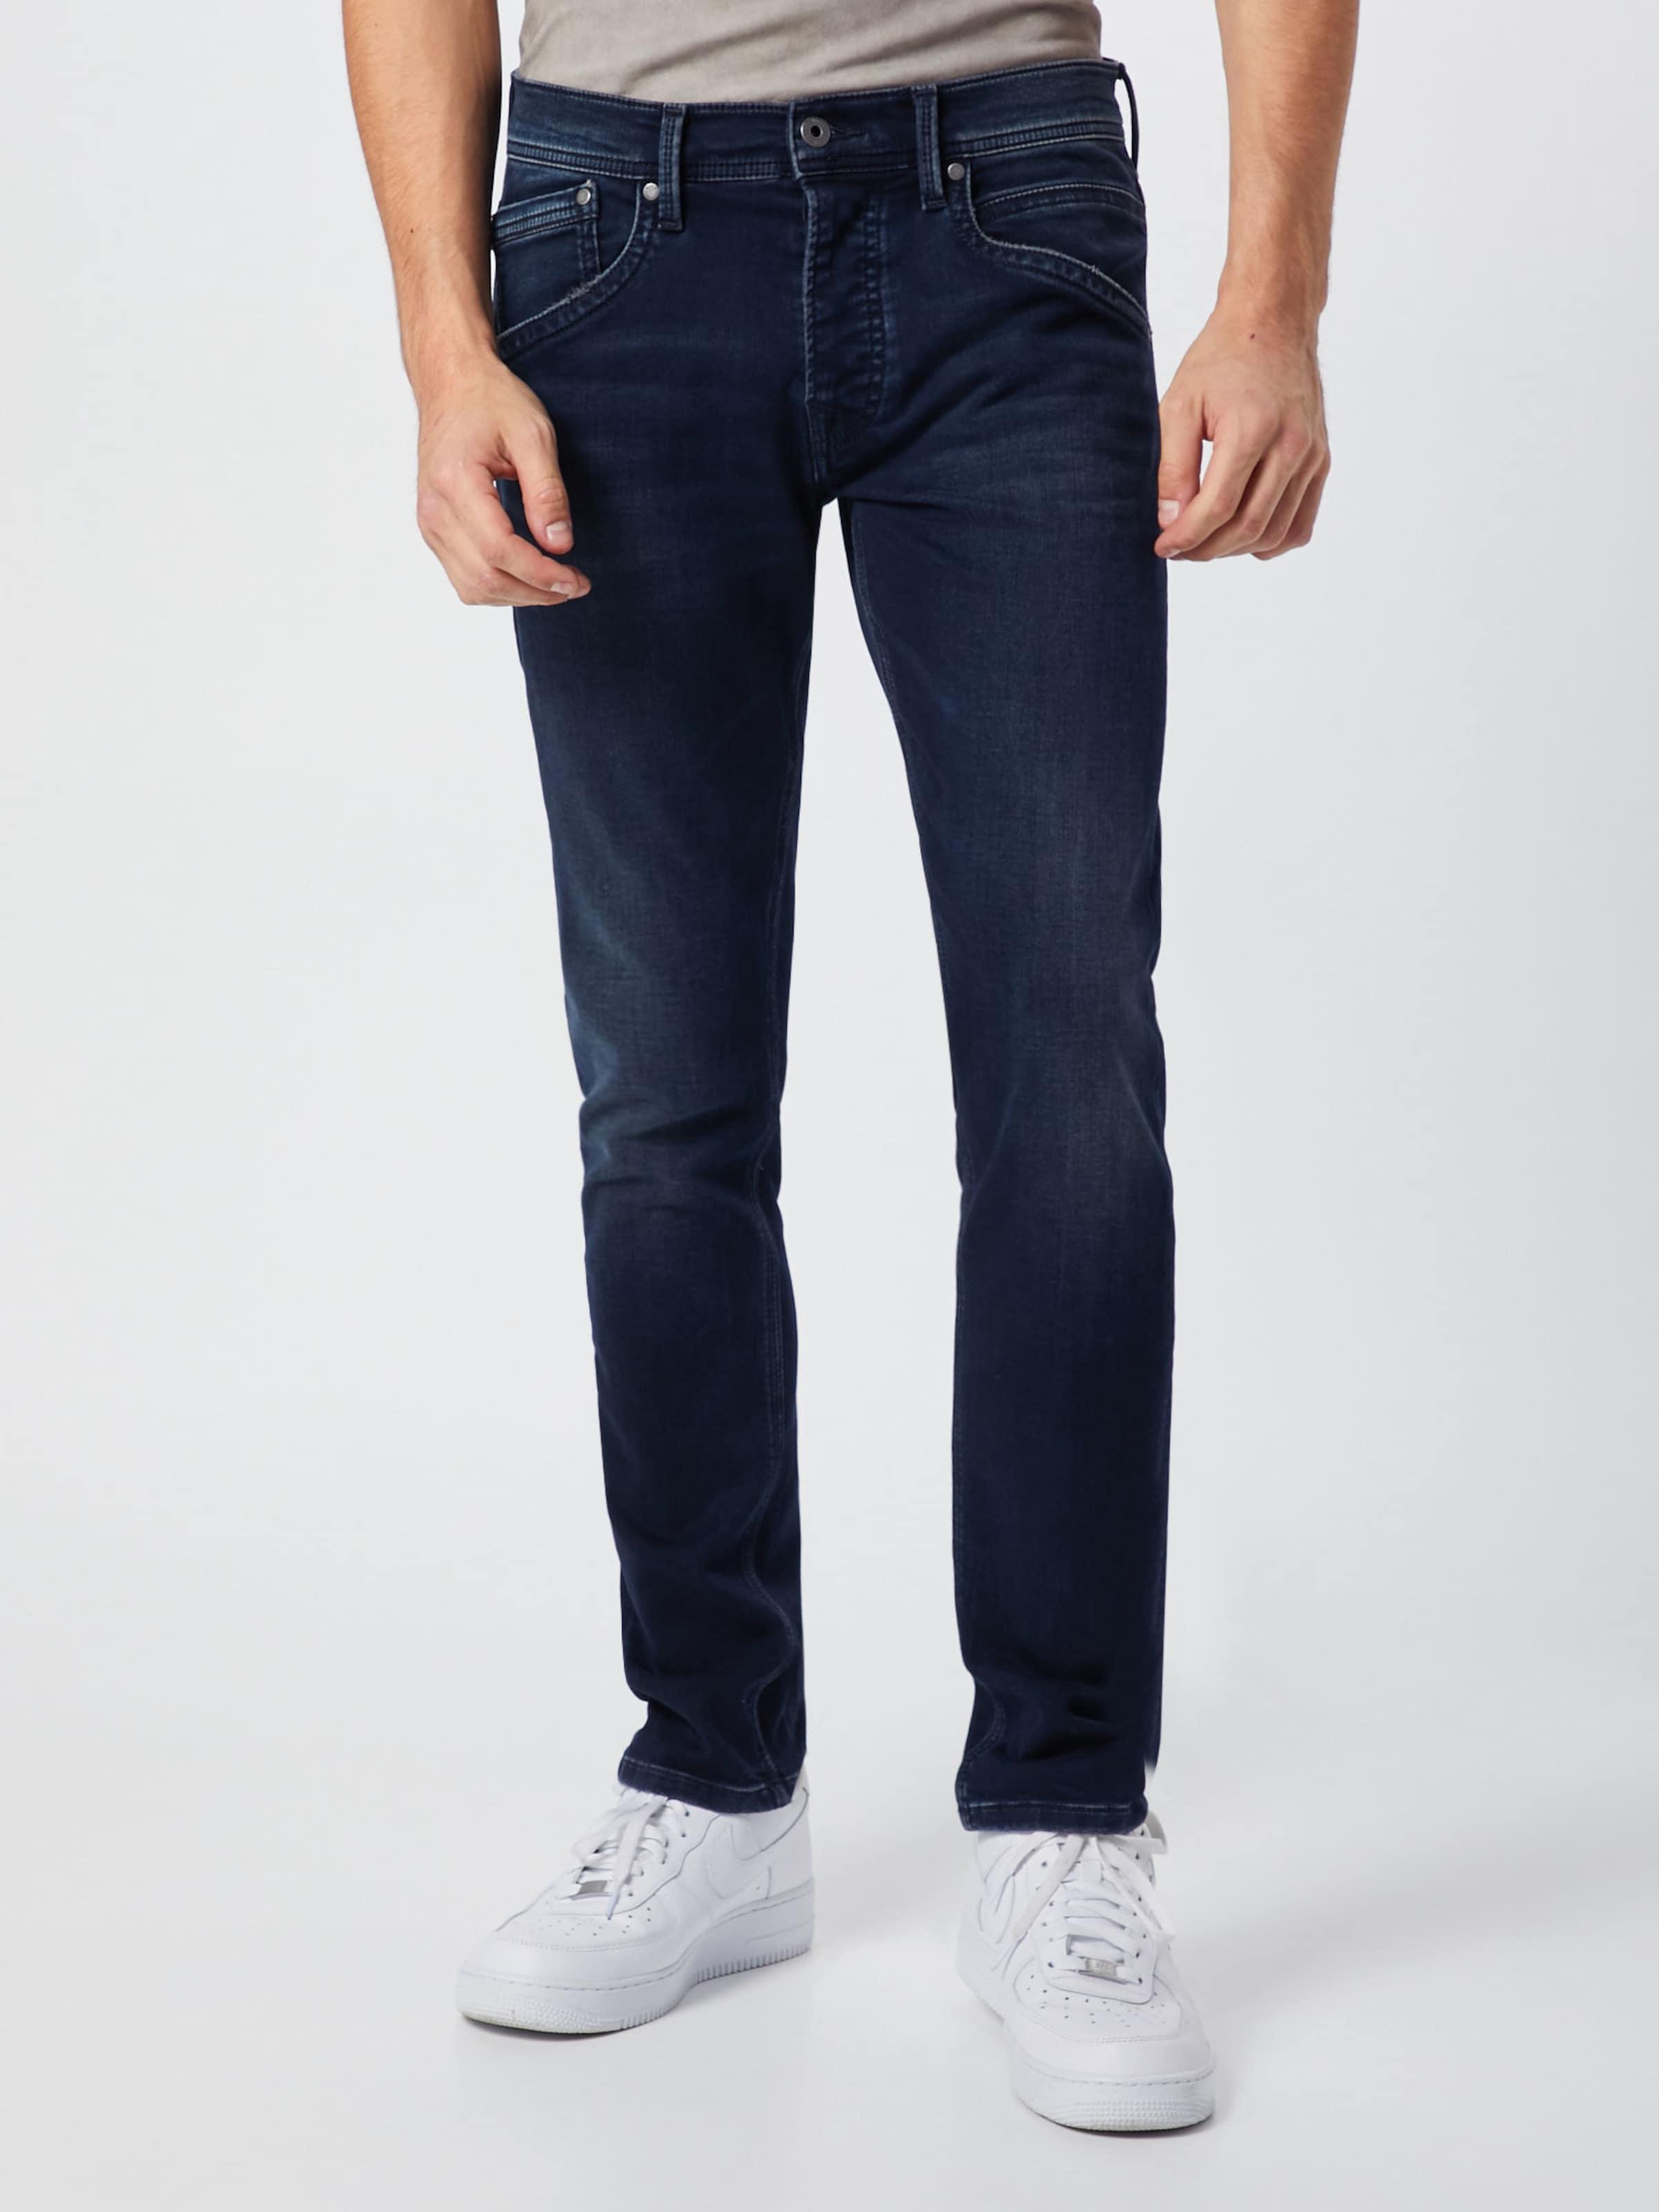 'track' Jeans Denim In DunkelblauBlack Pepe rCdxWeBo